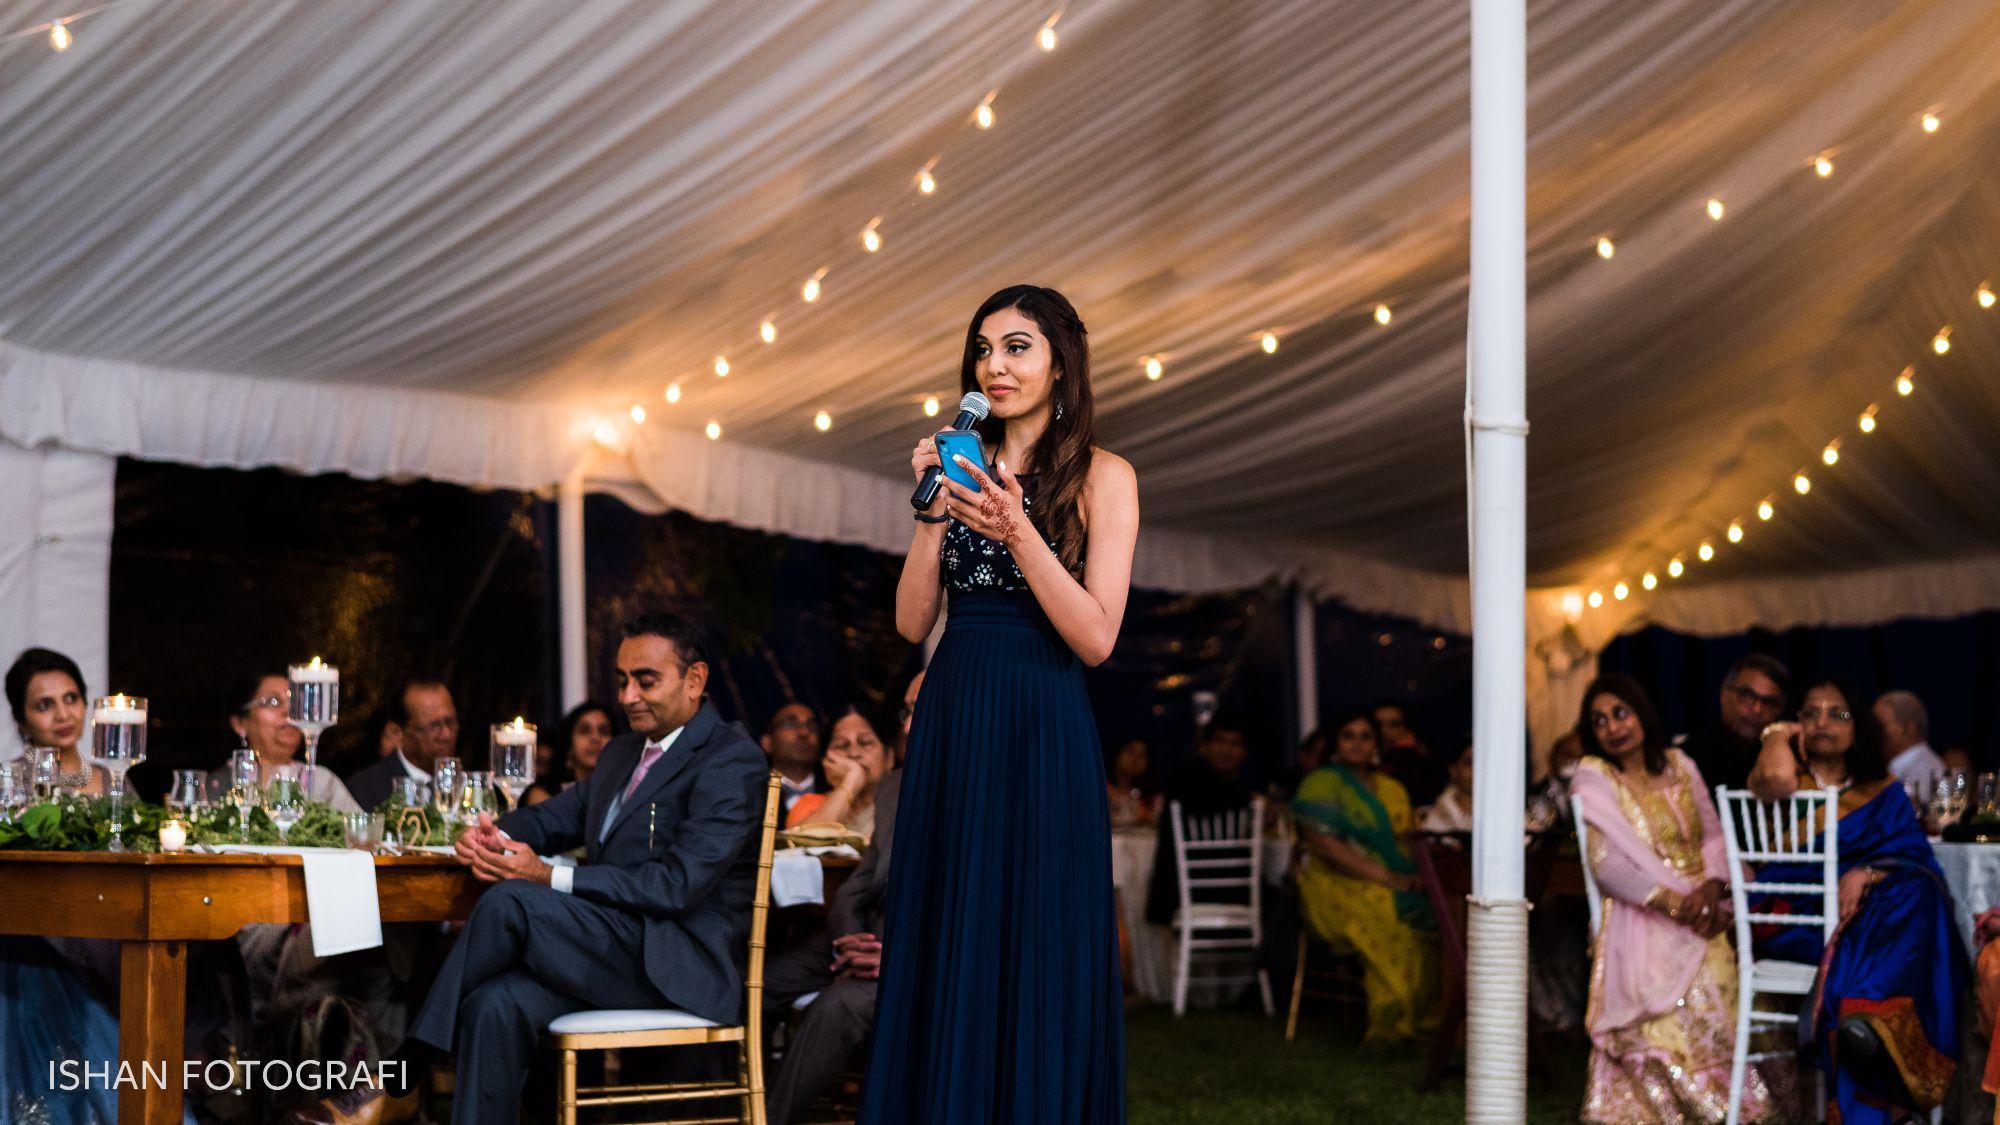 tent-wedding-reception-photos-kent-manor-inn